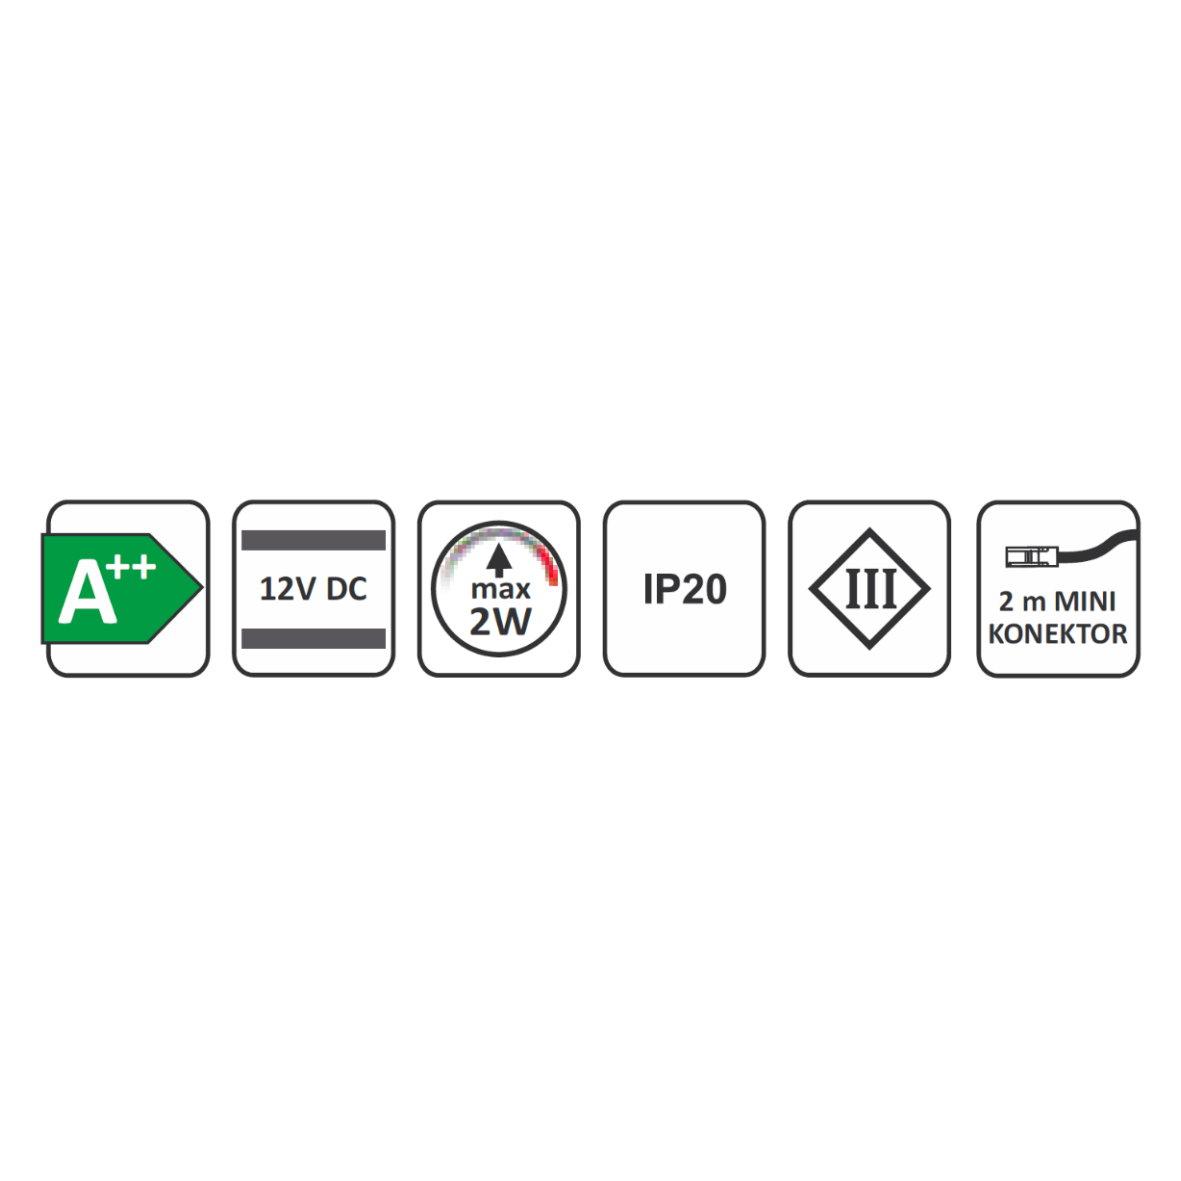 Led aluminium aufbaustrahler dimmbar 2w 120lm unterbau for Design artikel shop